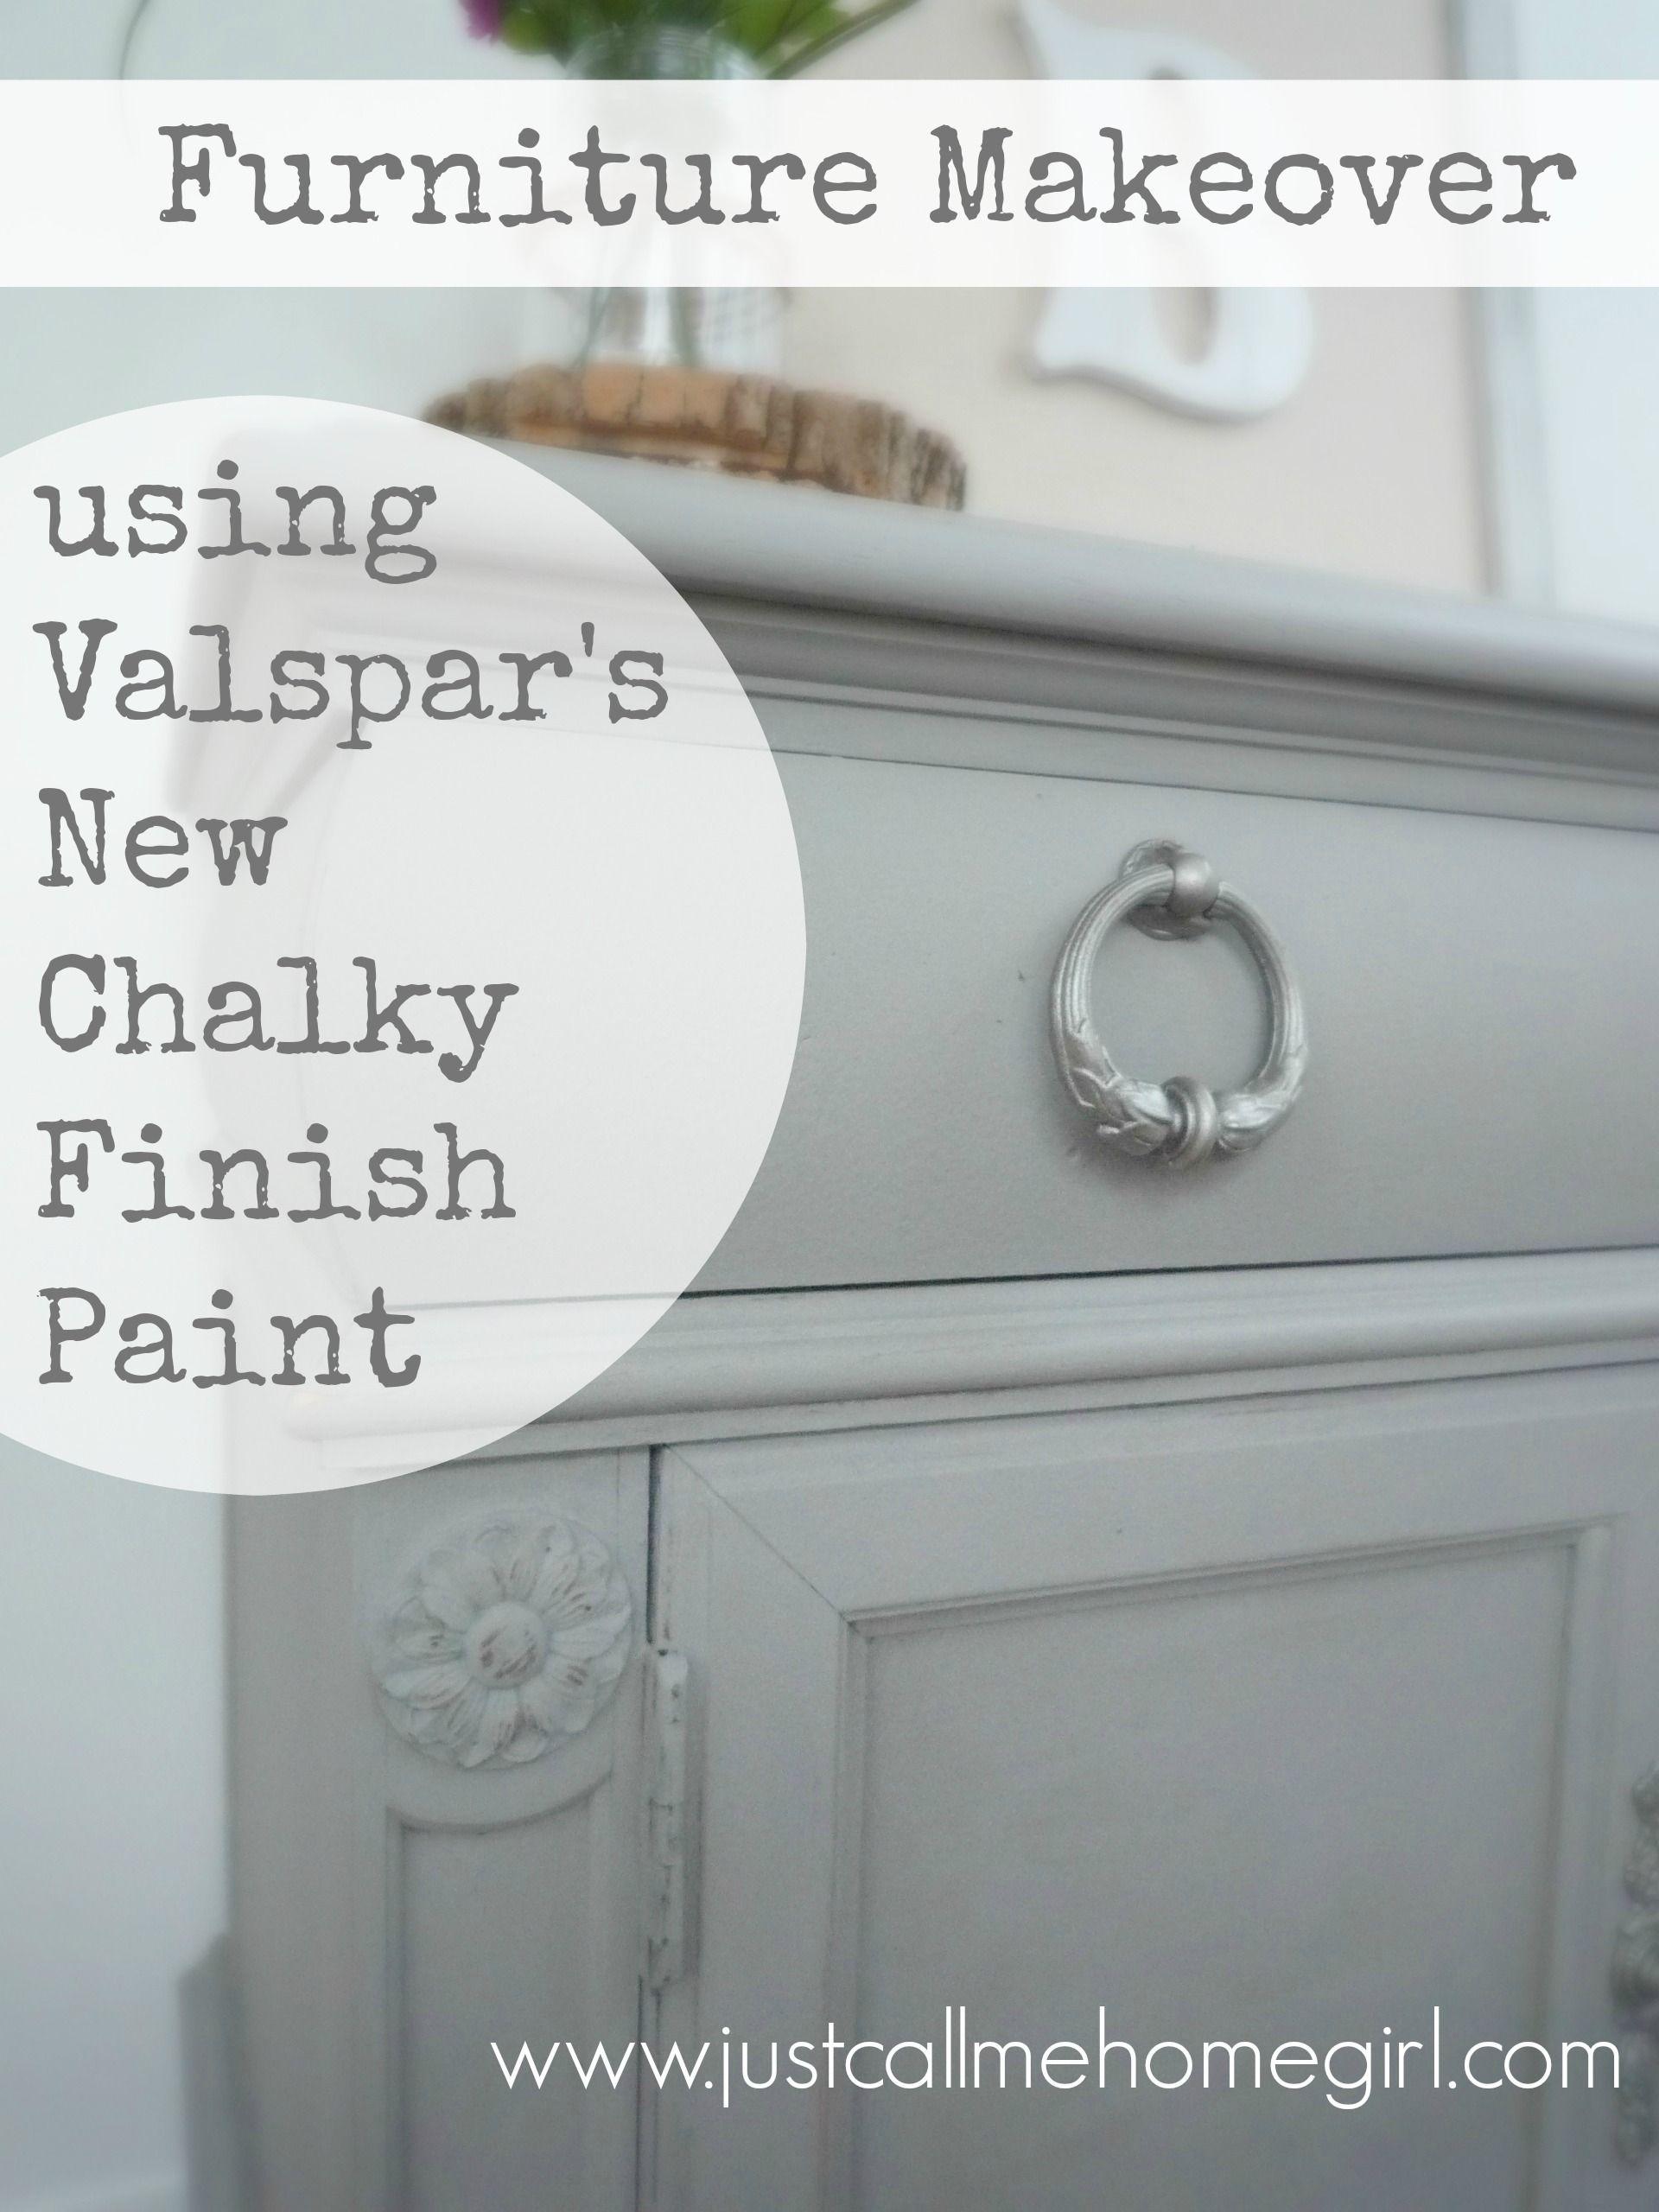 Lowes Valspar Chalk Paint : lowes, valspar, chalk, paint, Valspar's, Chalky, Finish, Paint, Makeover, Homegirl, Paint,, Chalk, Colors, Furniture,, Furniture